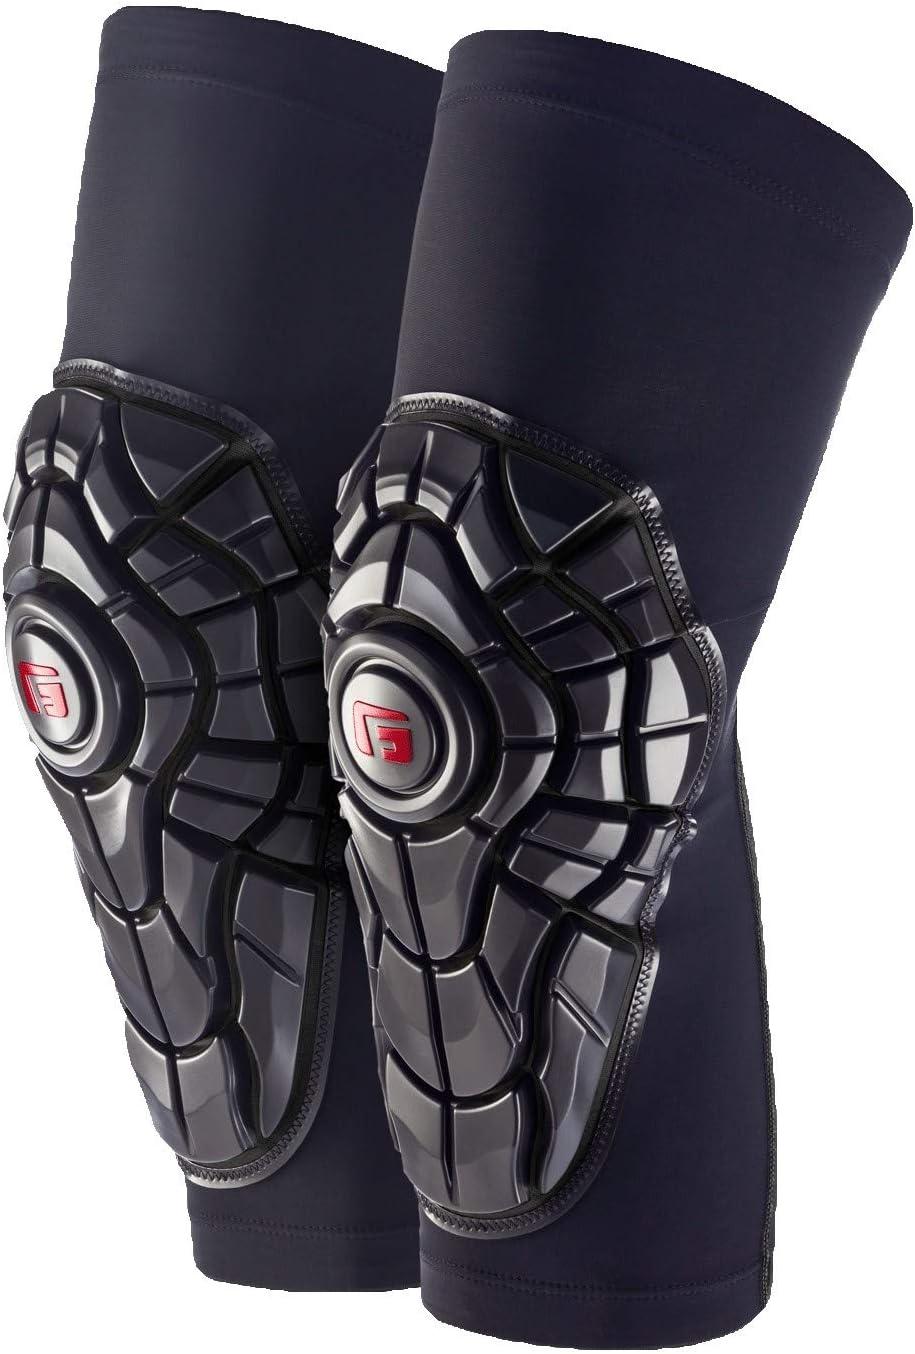 Black Topo G-Form Elite Bicycle Knee Shin Pad Size Medium